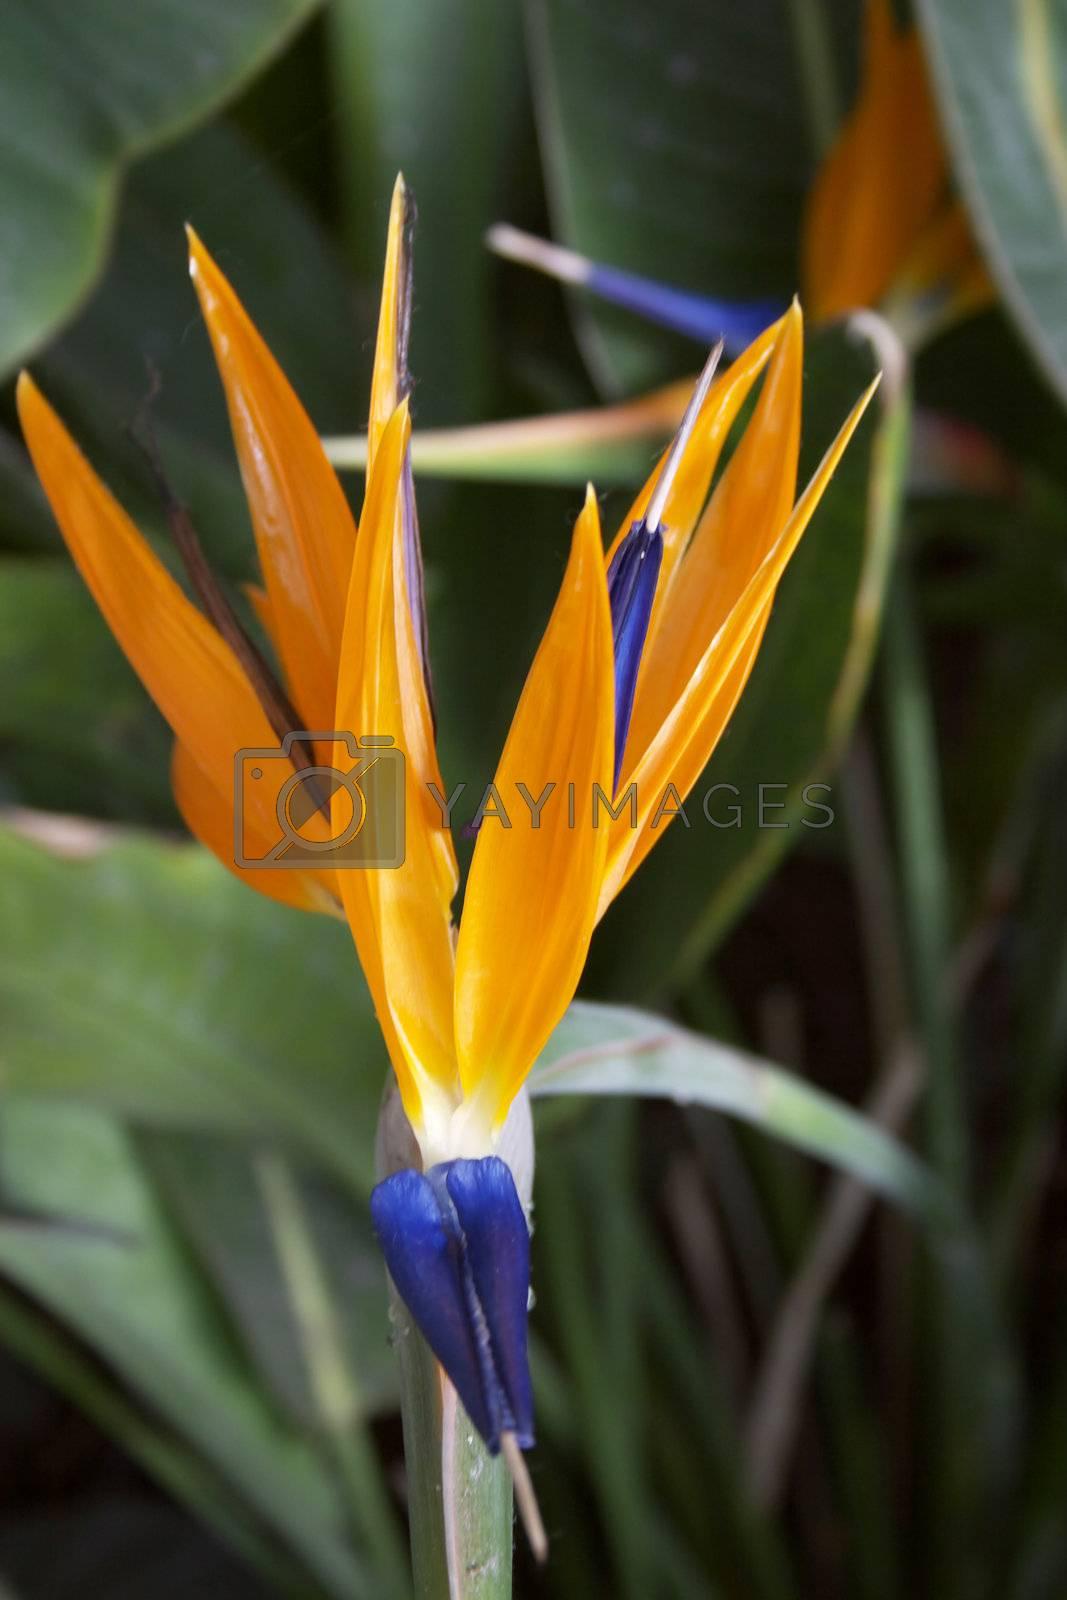 Strelitzia, Crane Flower or Bird of Paradise flower